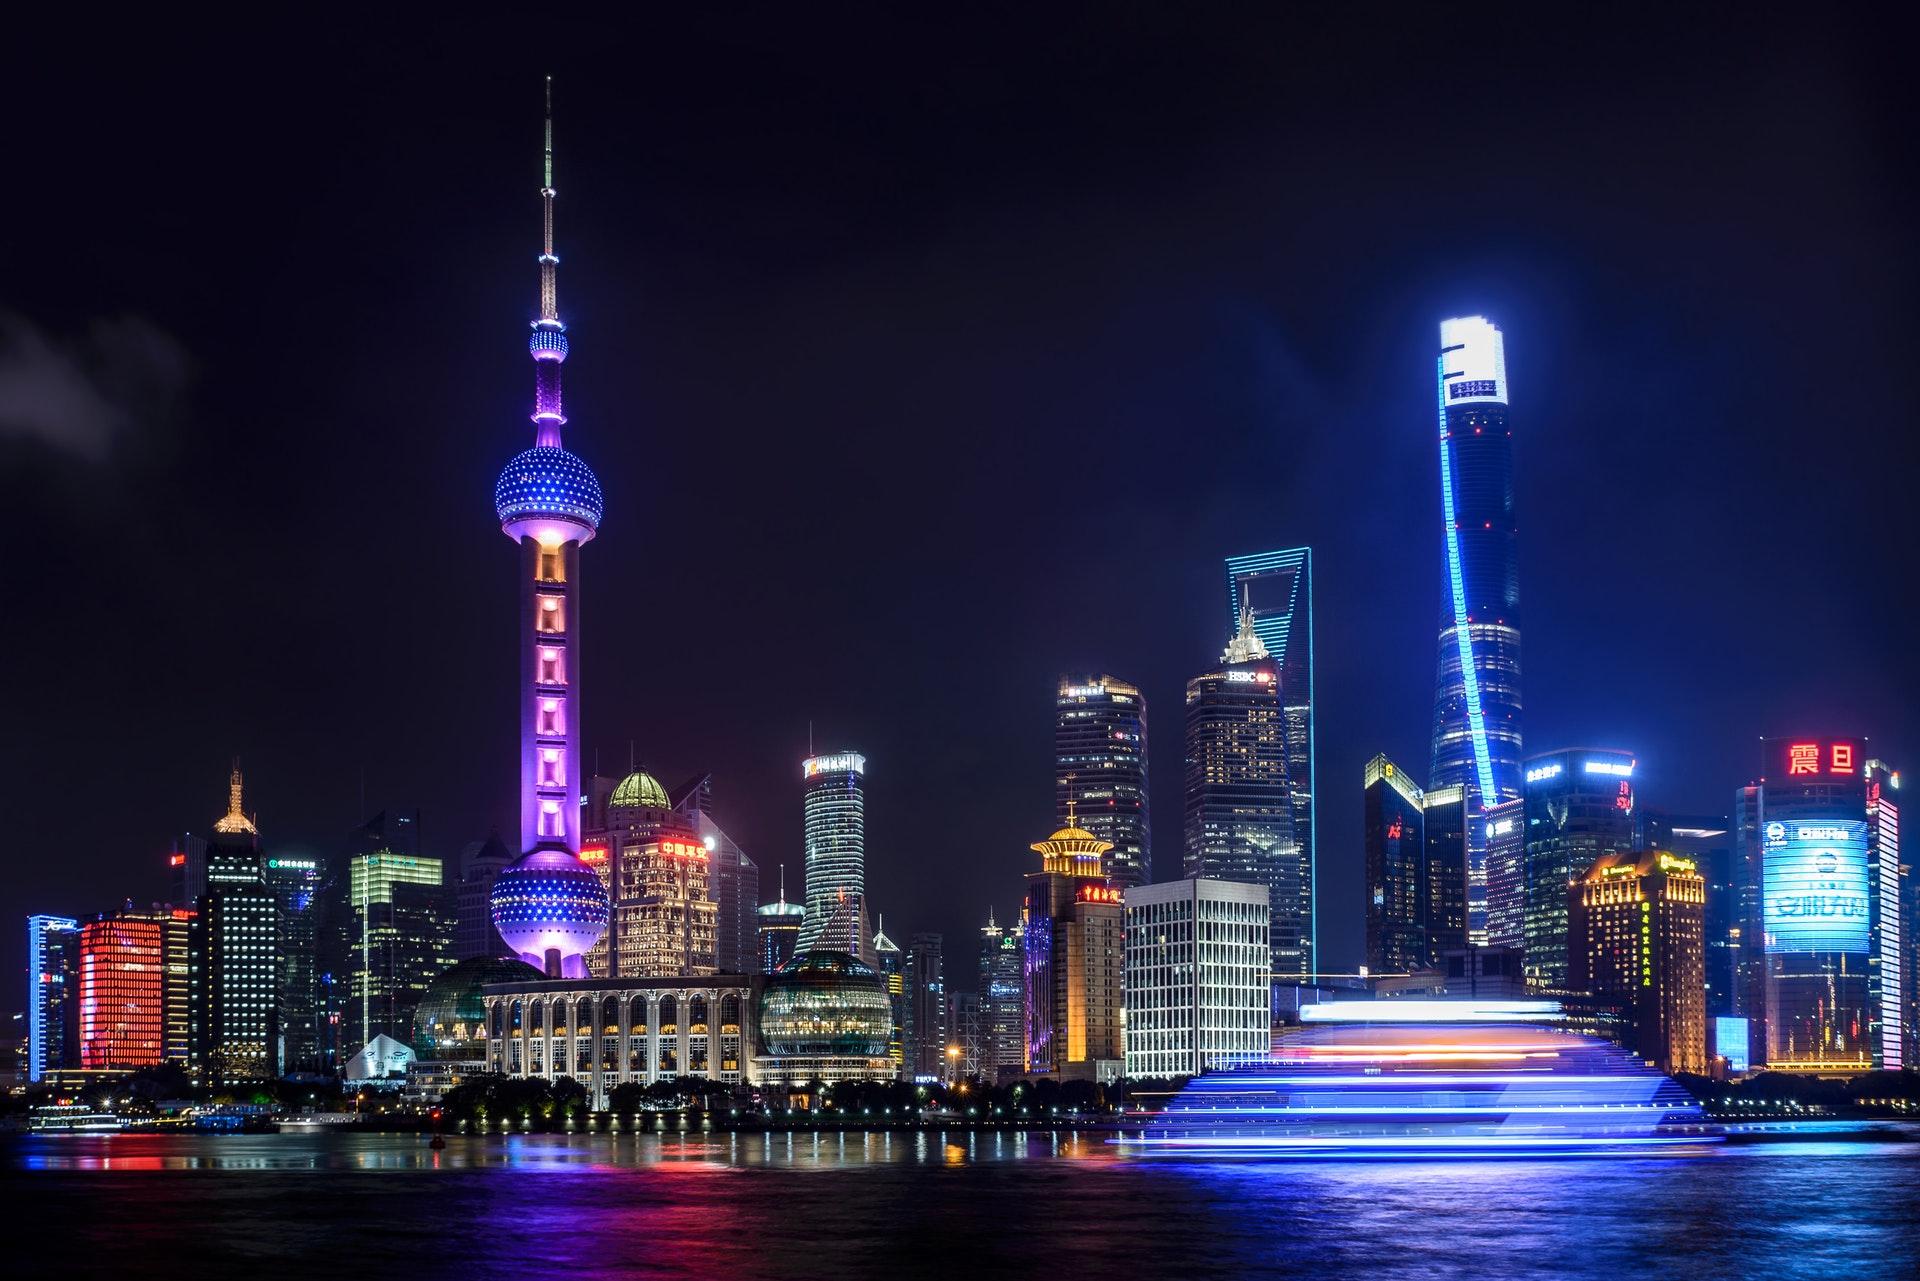 Kina, storby, by